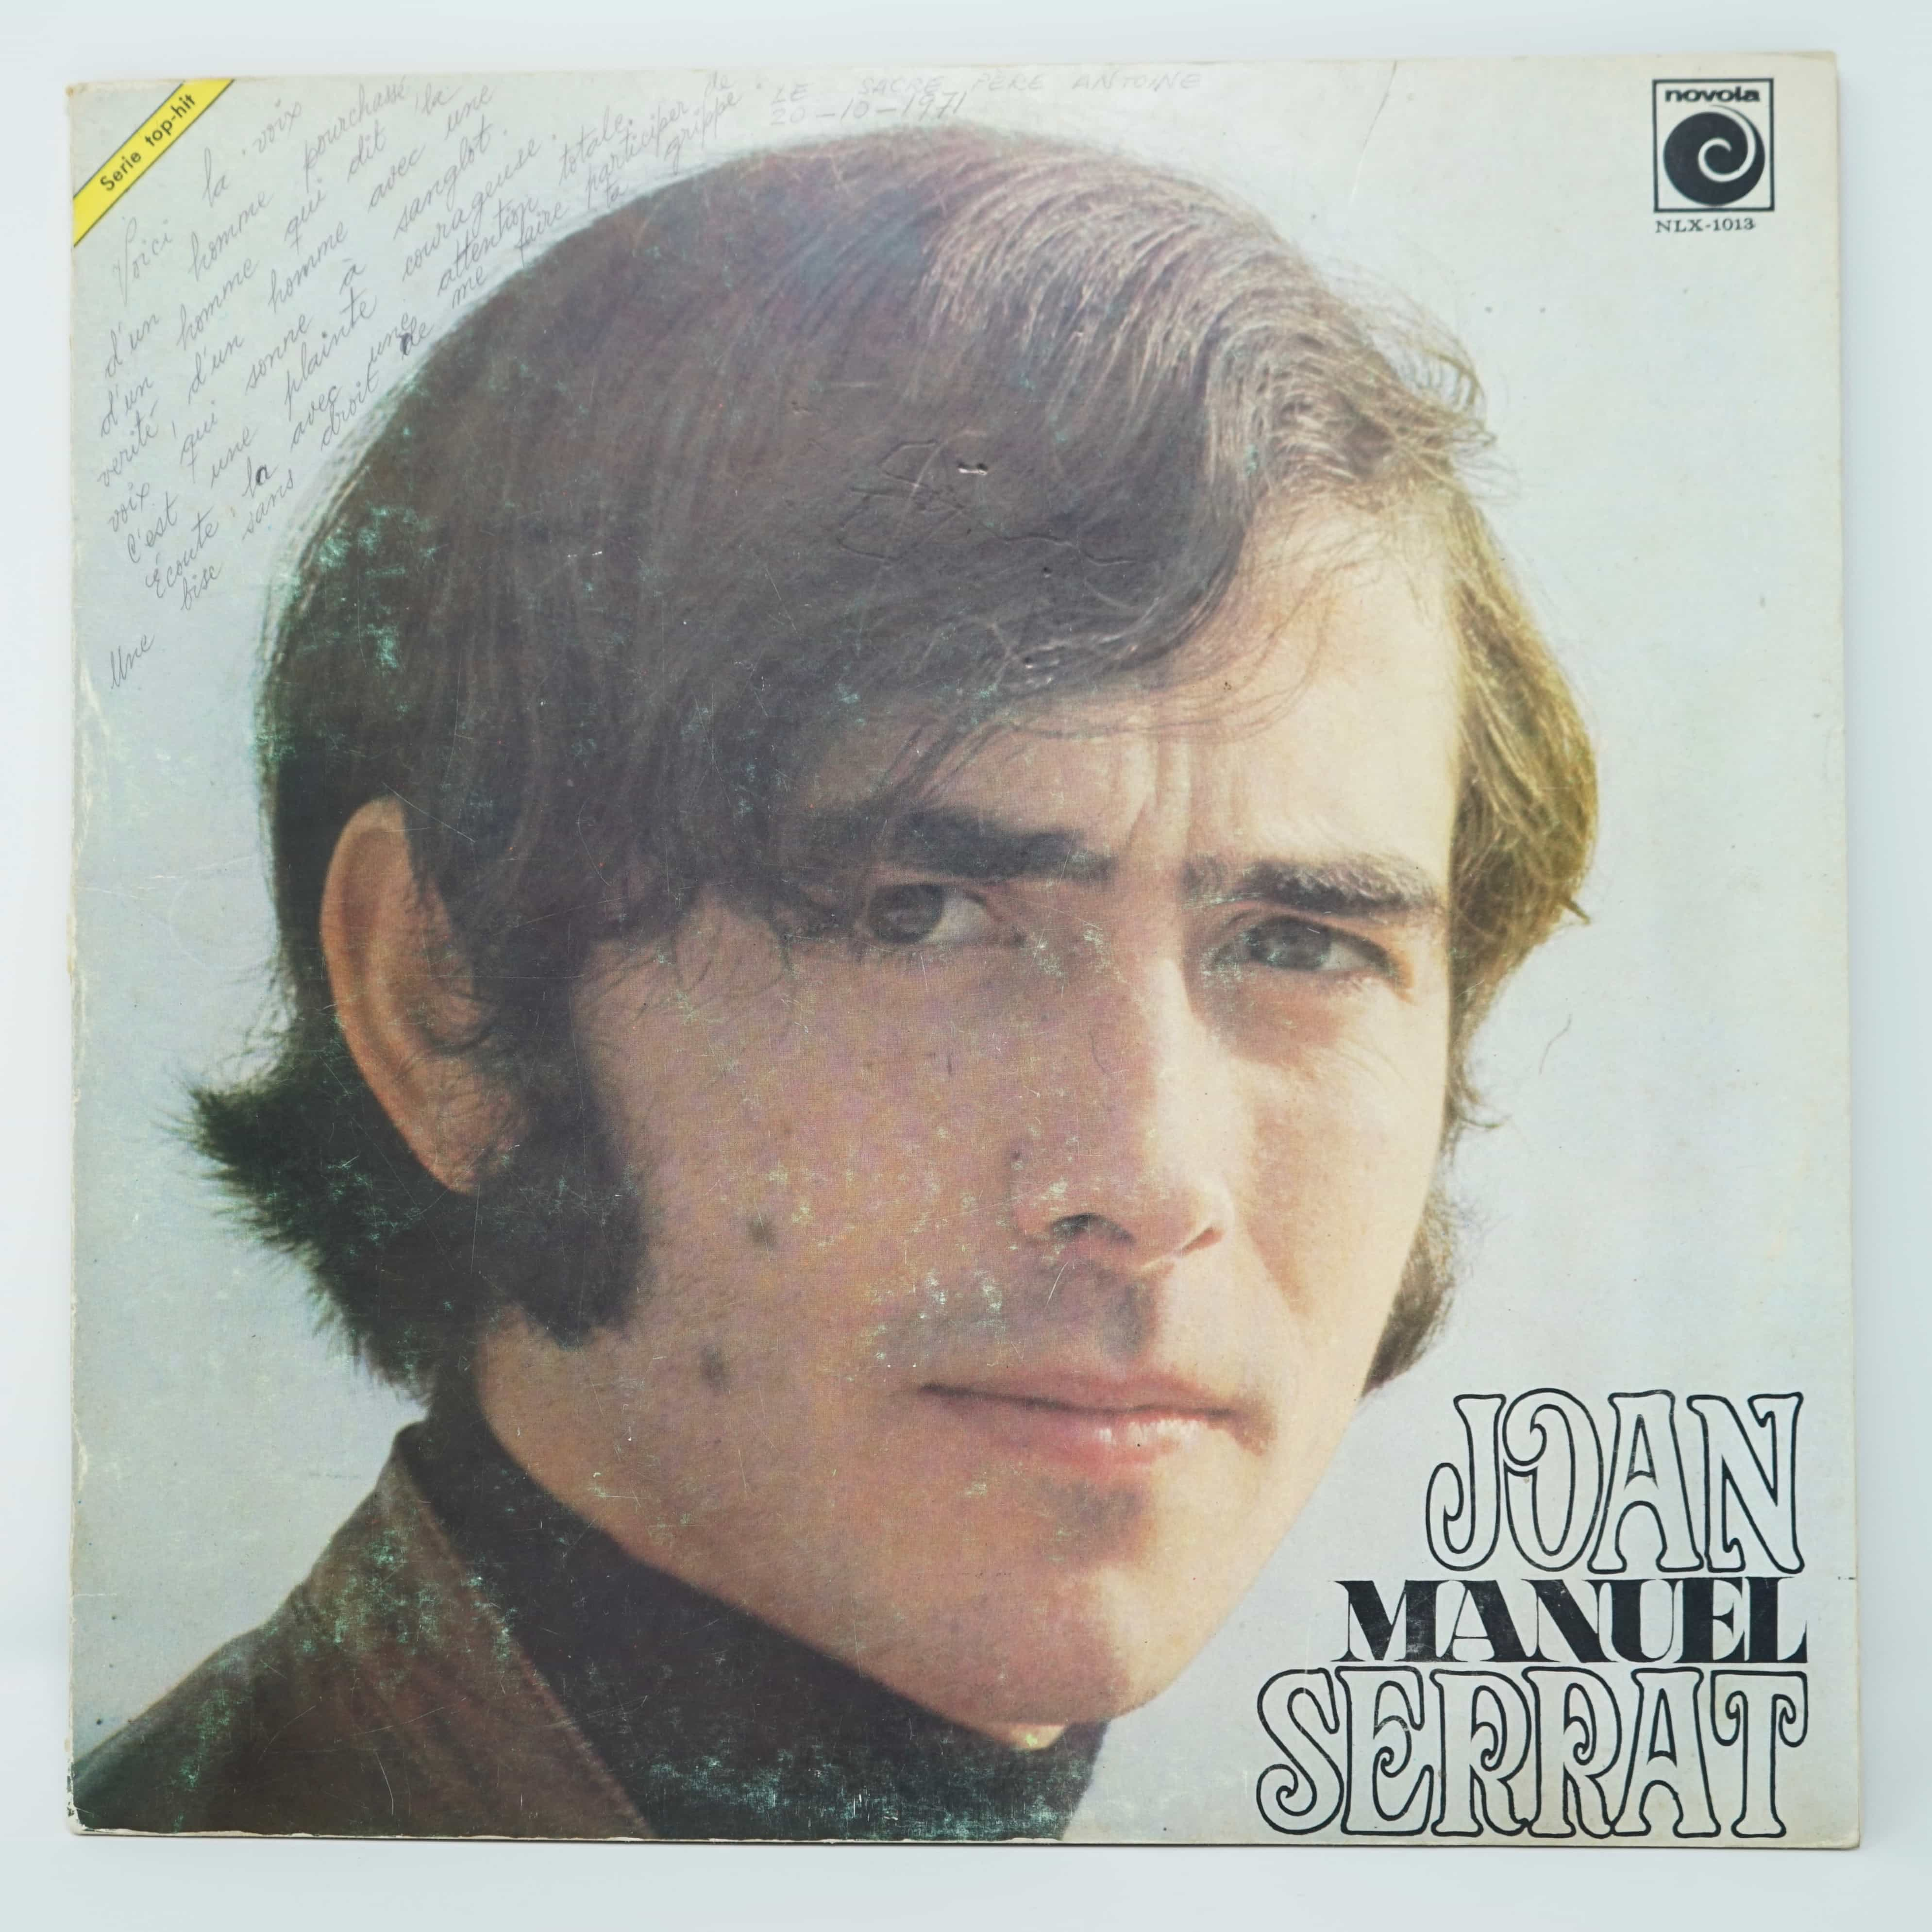 Vinyle de Joan Manel Serrat Dedicacé